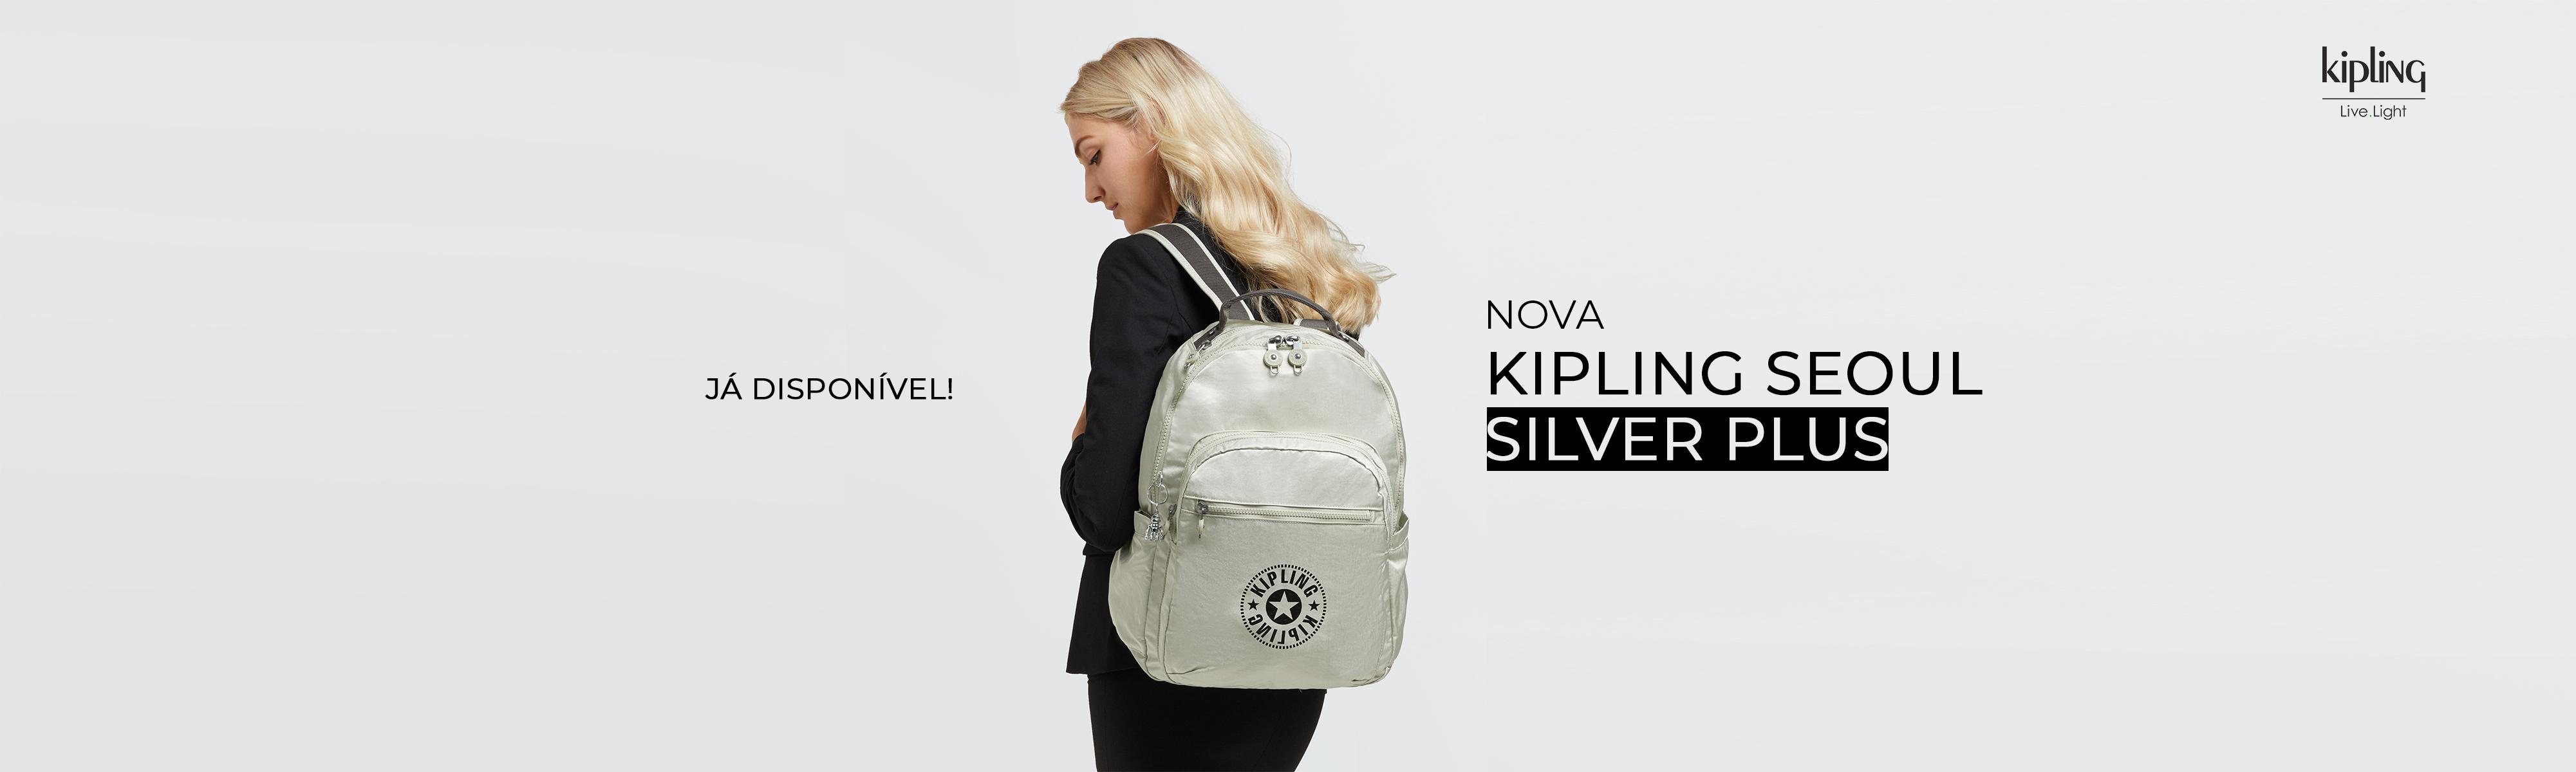 Mochila Kipling Seoul Silver Plus